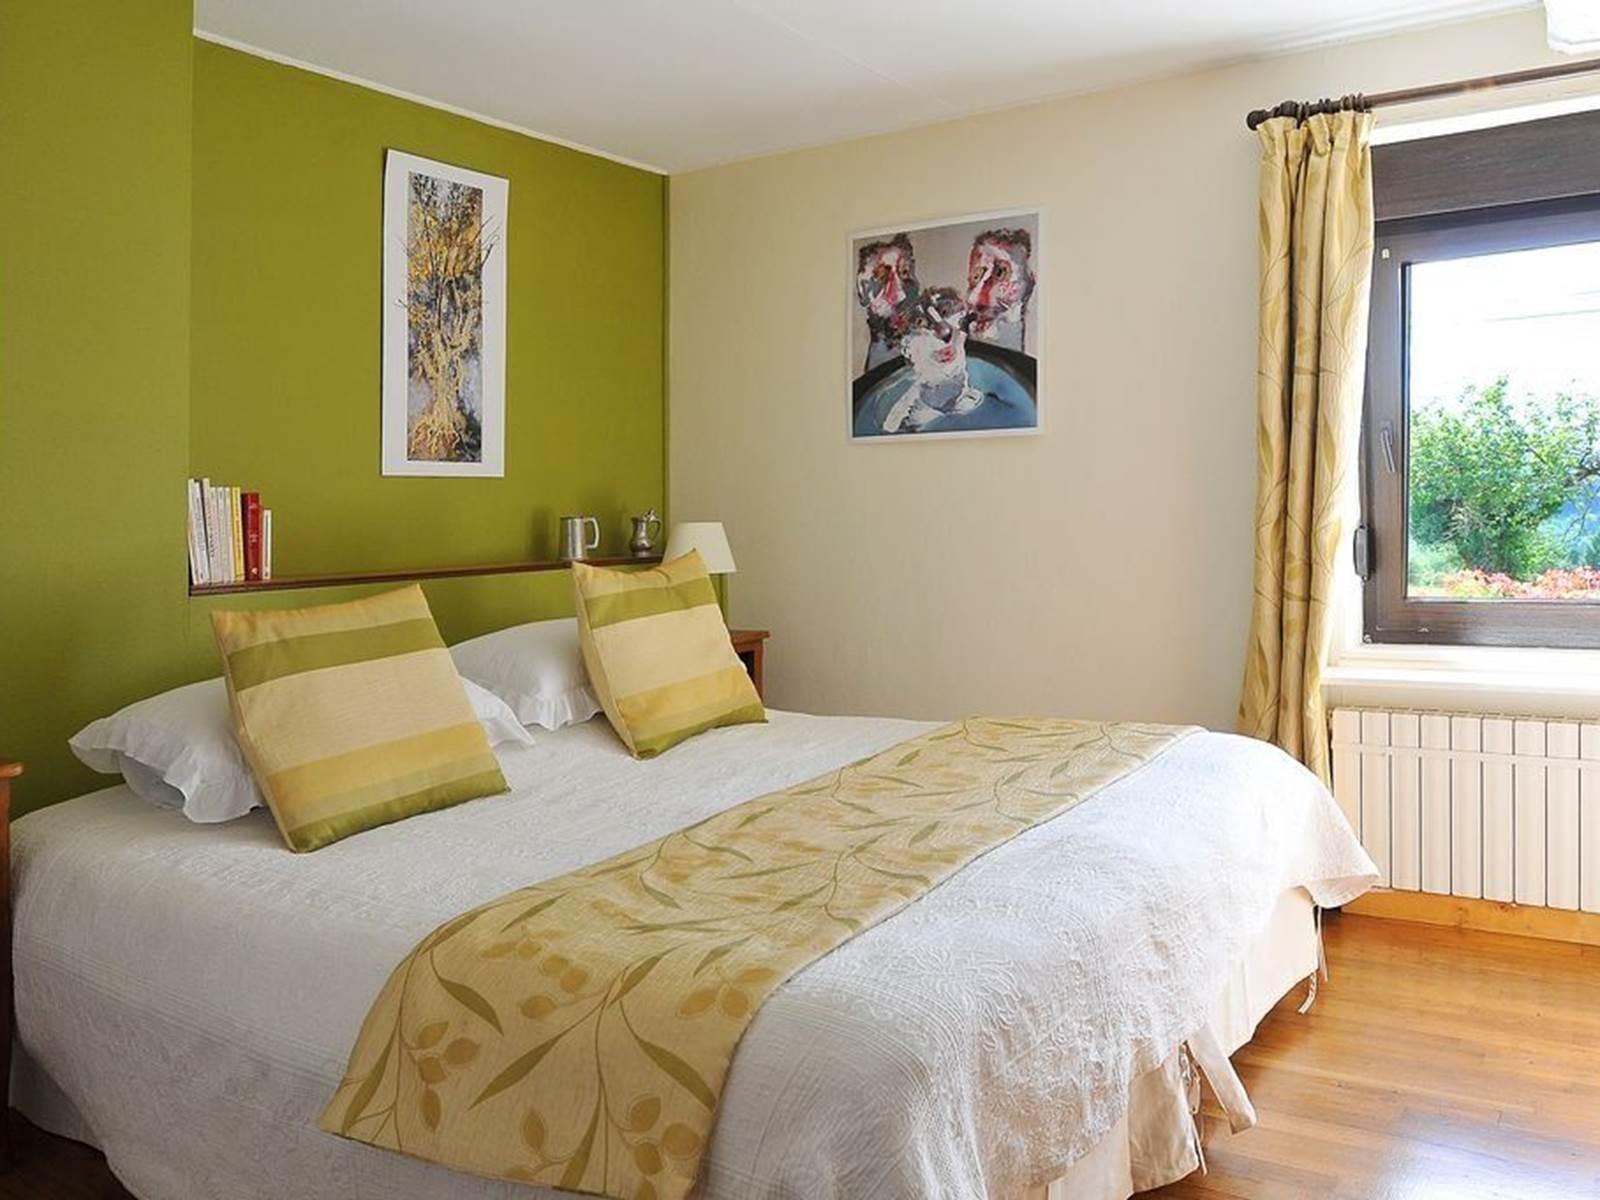 Chambre double Paul Rebeyrolle , lit de 1,80m x 2,00m